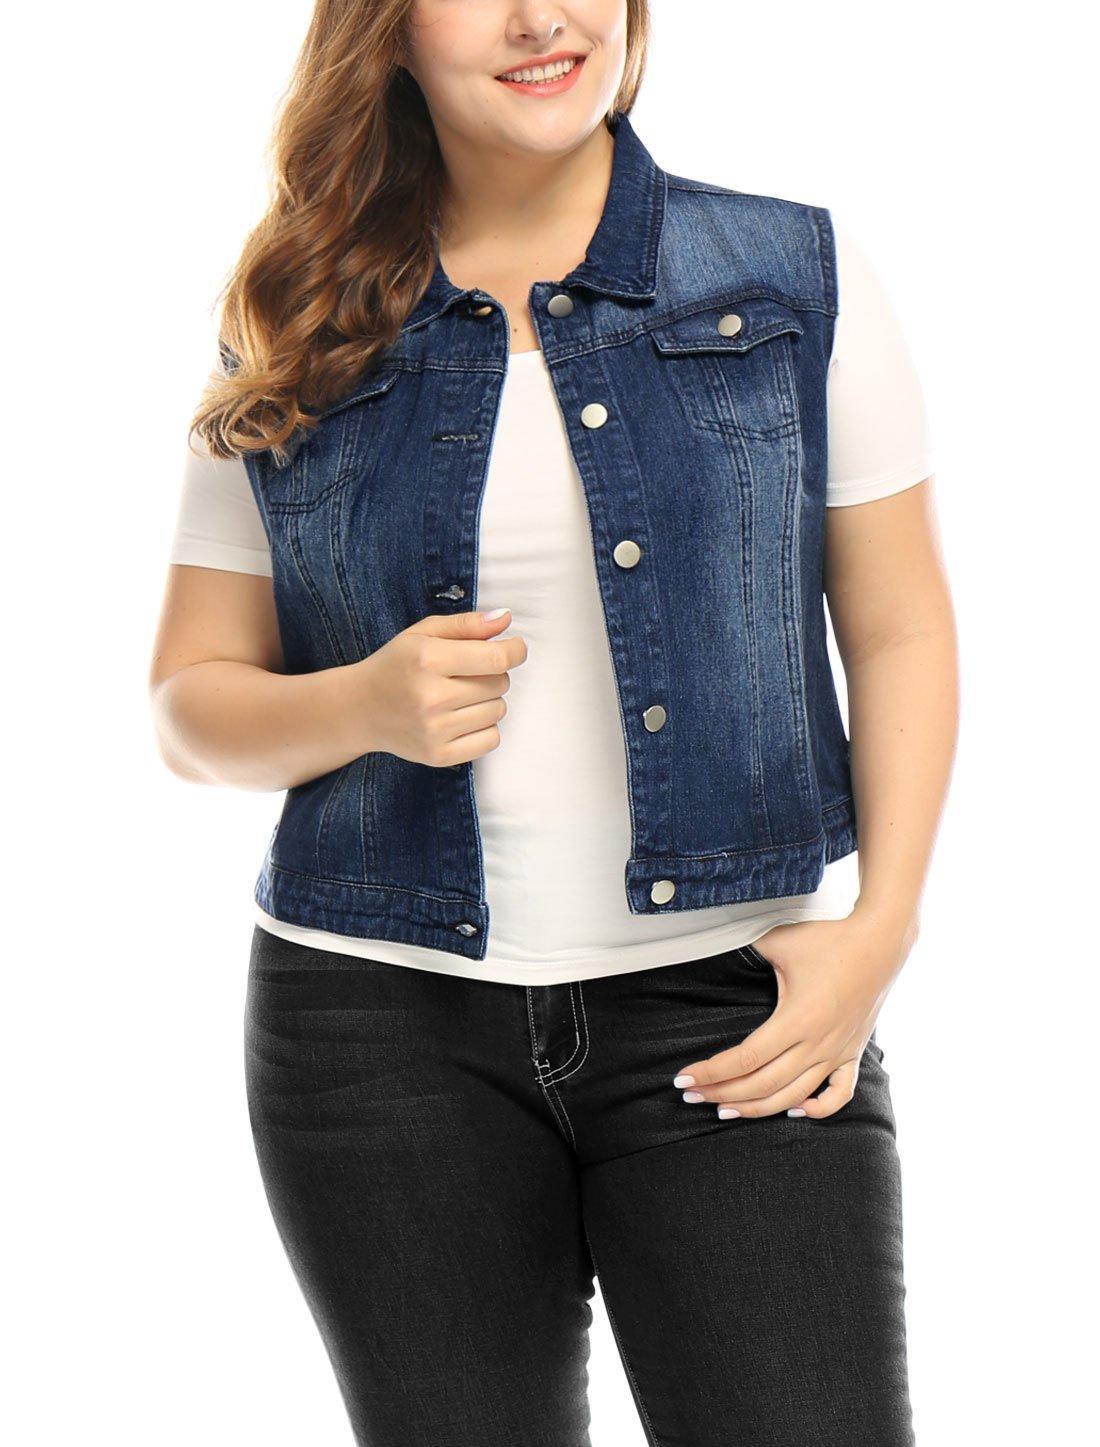 uxcell Women Plus Size Slim Fit Denim Vest Blue 1X by uxcell (Image #2)